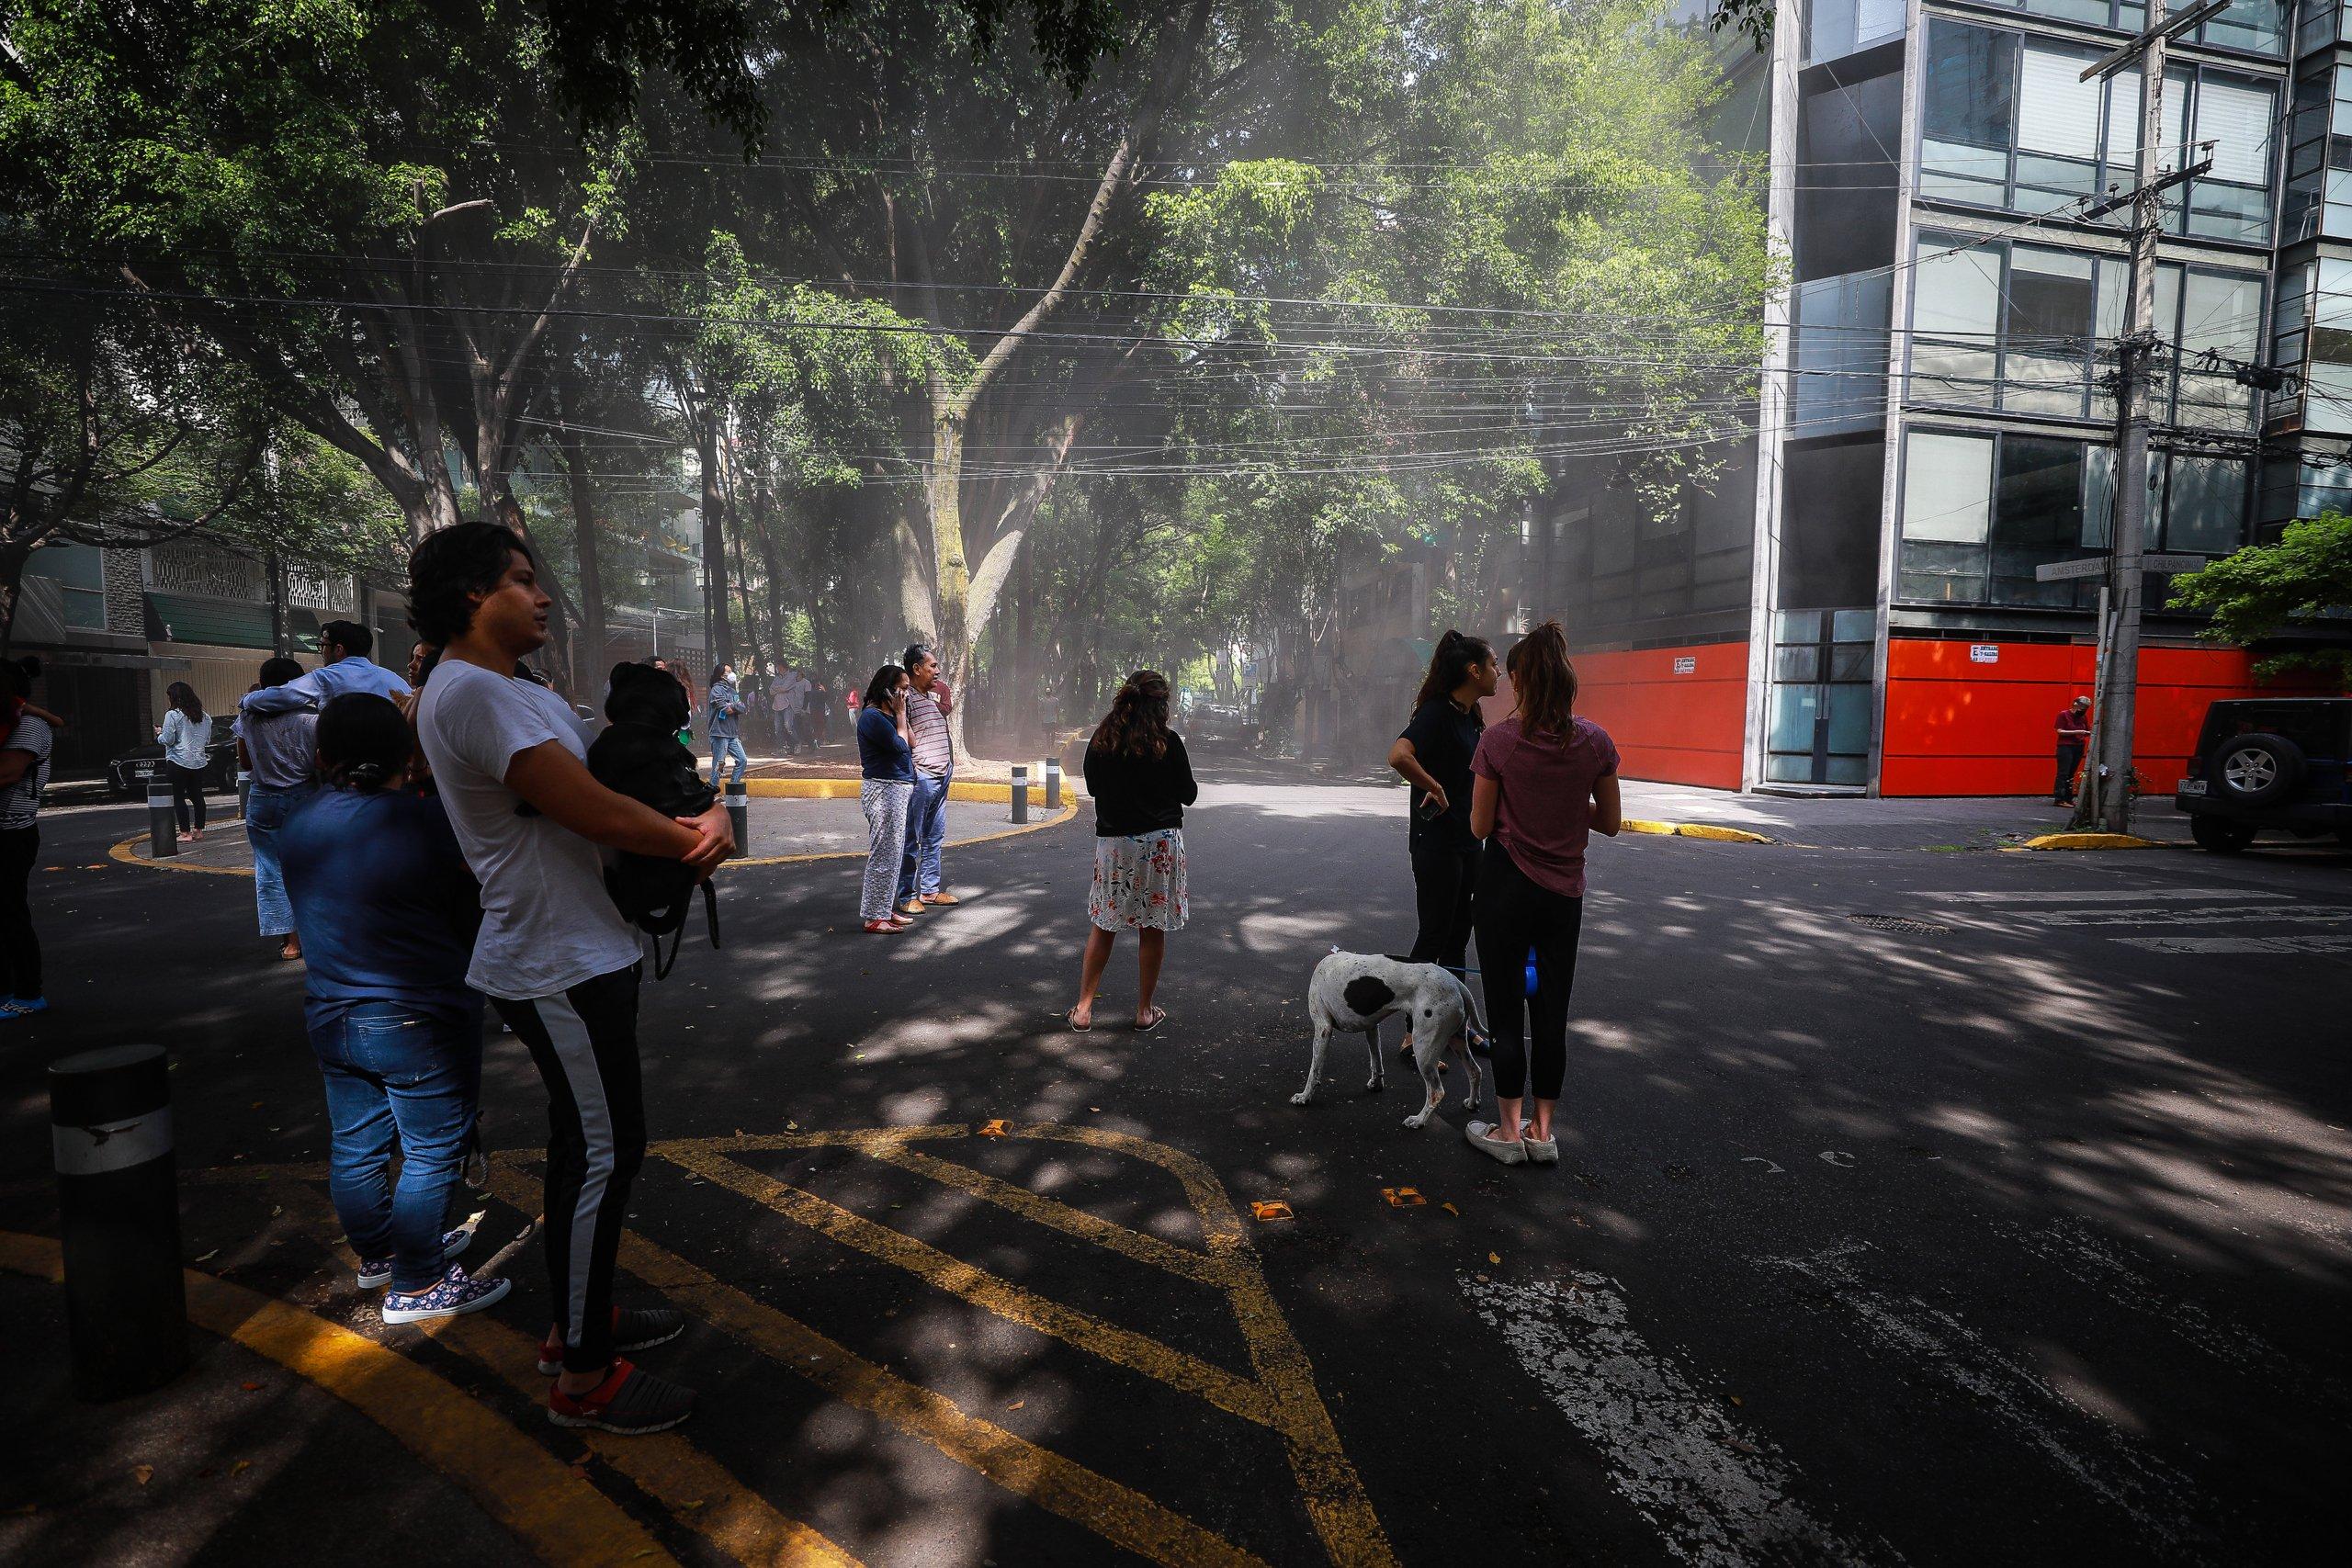 Magnitude 7.5 Earthquake Hits Mexico City